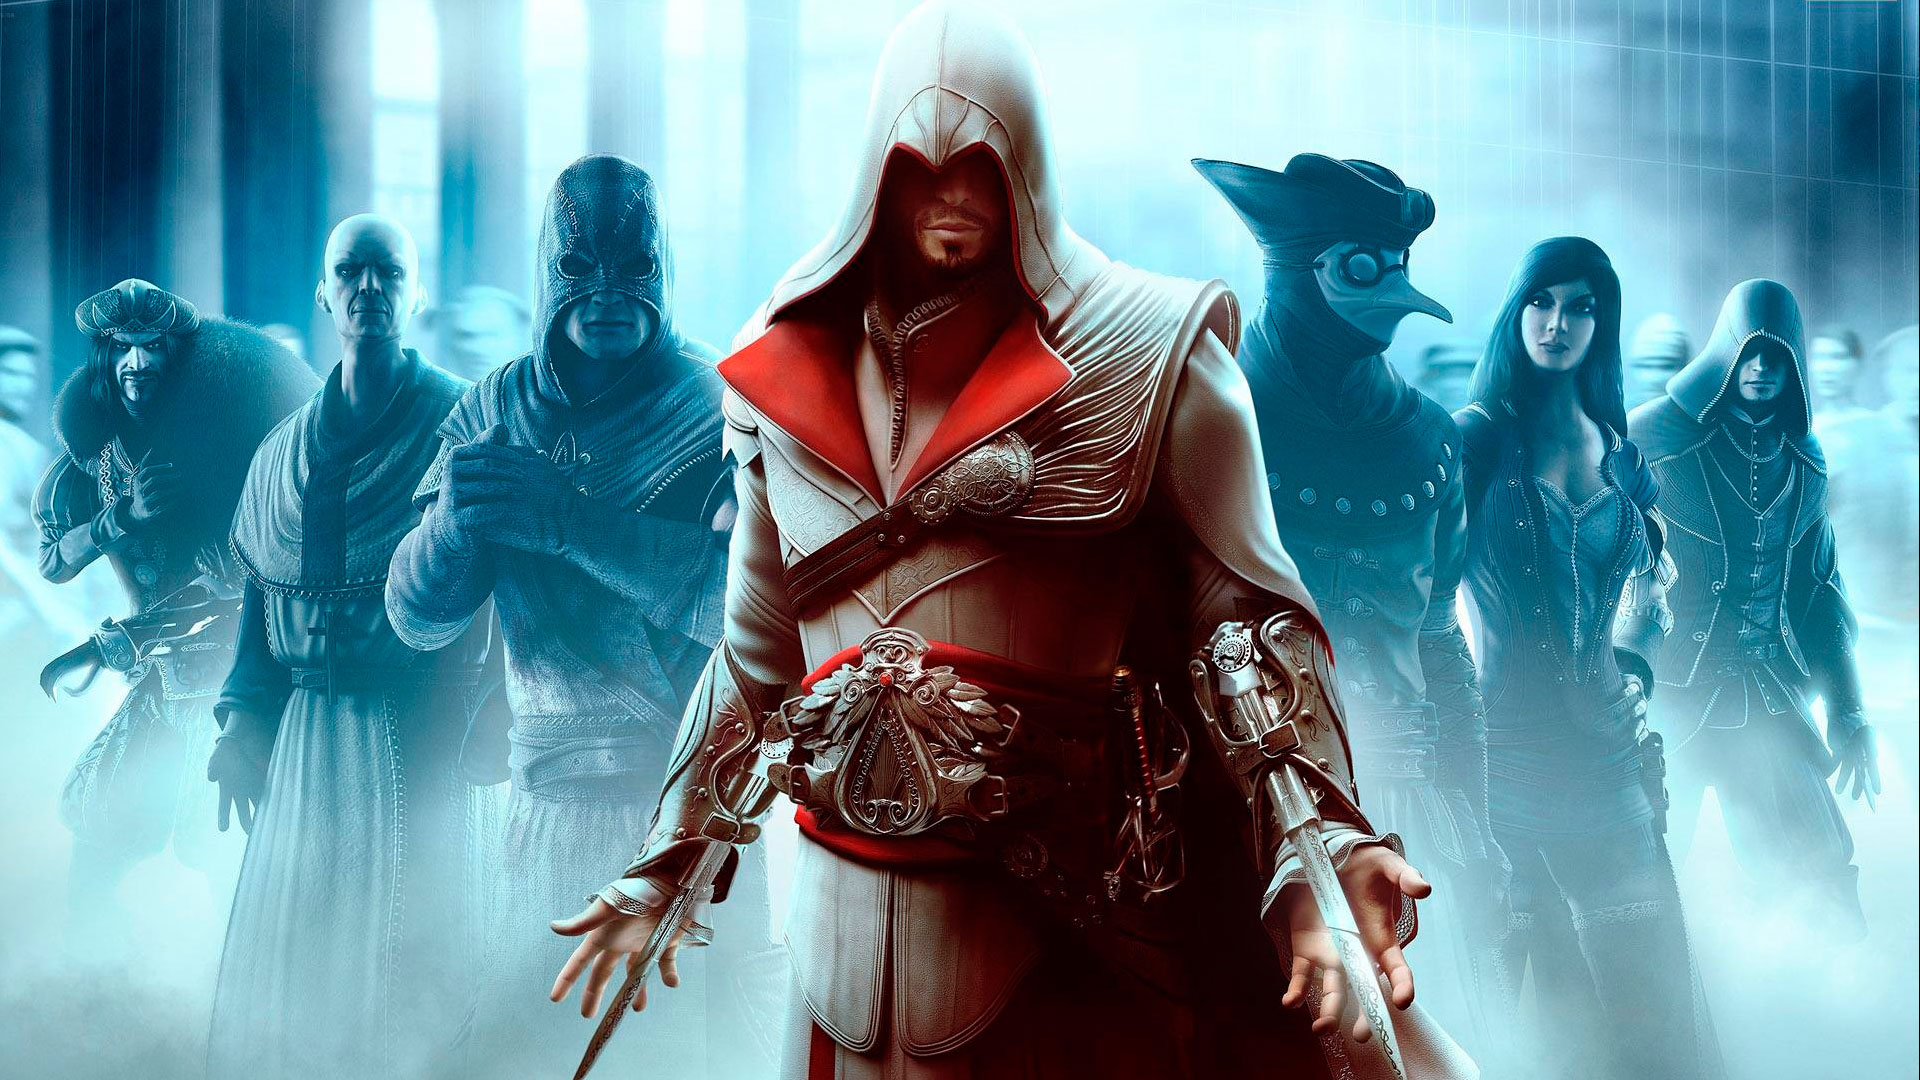 Assassins Creed Brotherhood 1080p Wallpaper Assassins Creed 1920x1080